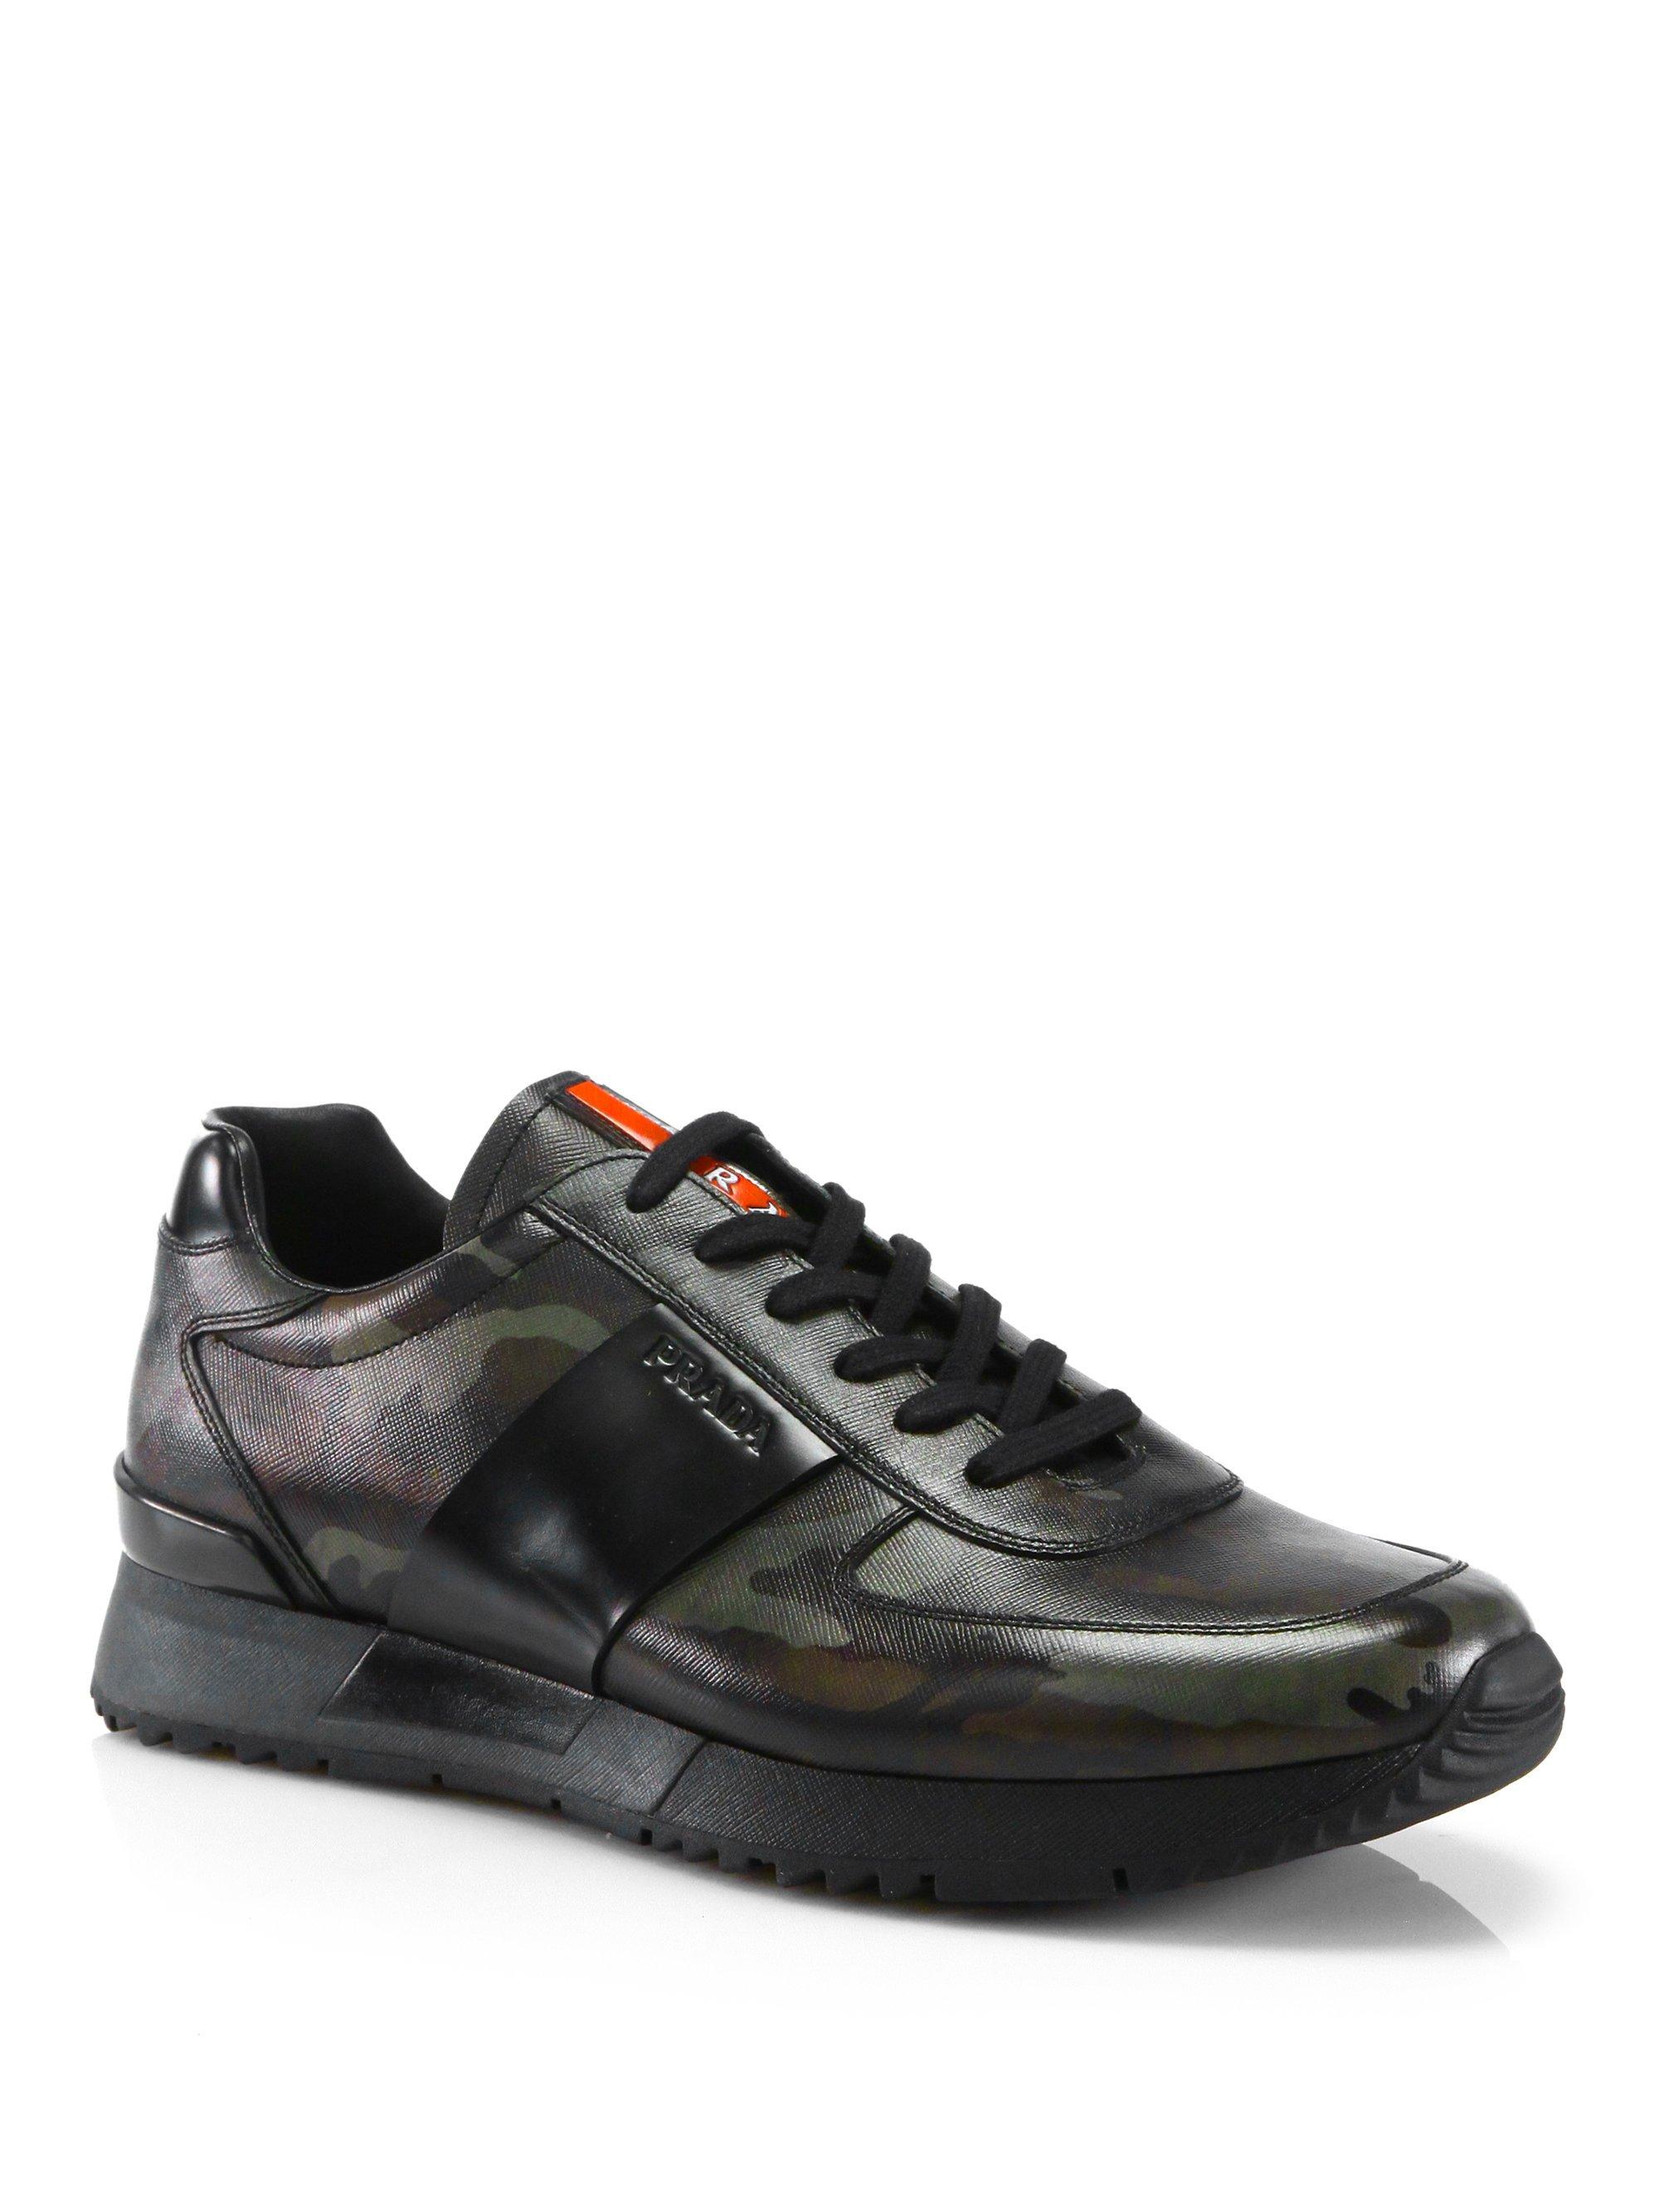 Mens Prada Camouflage Shoes